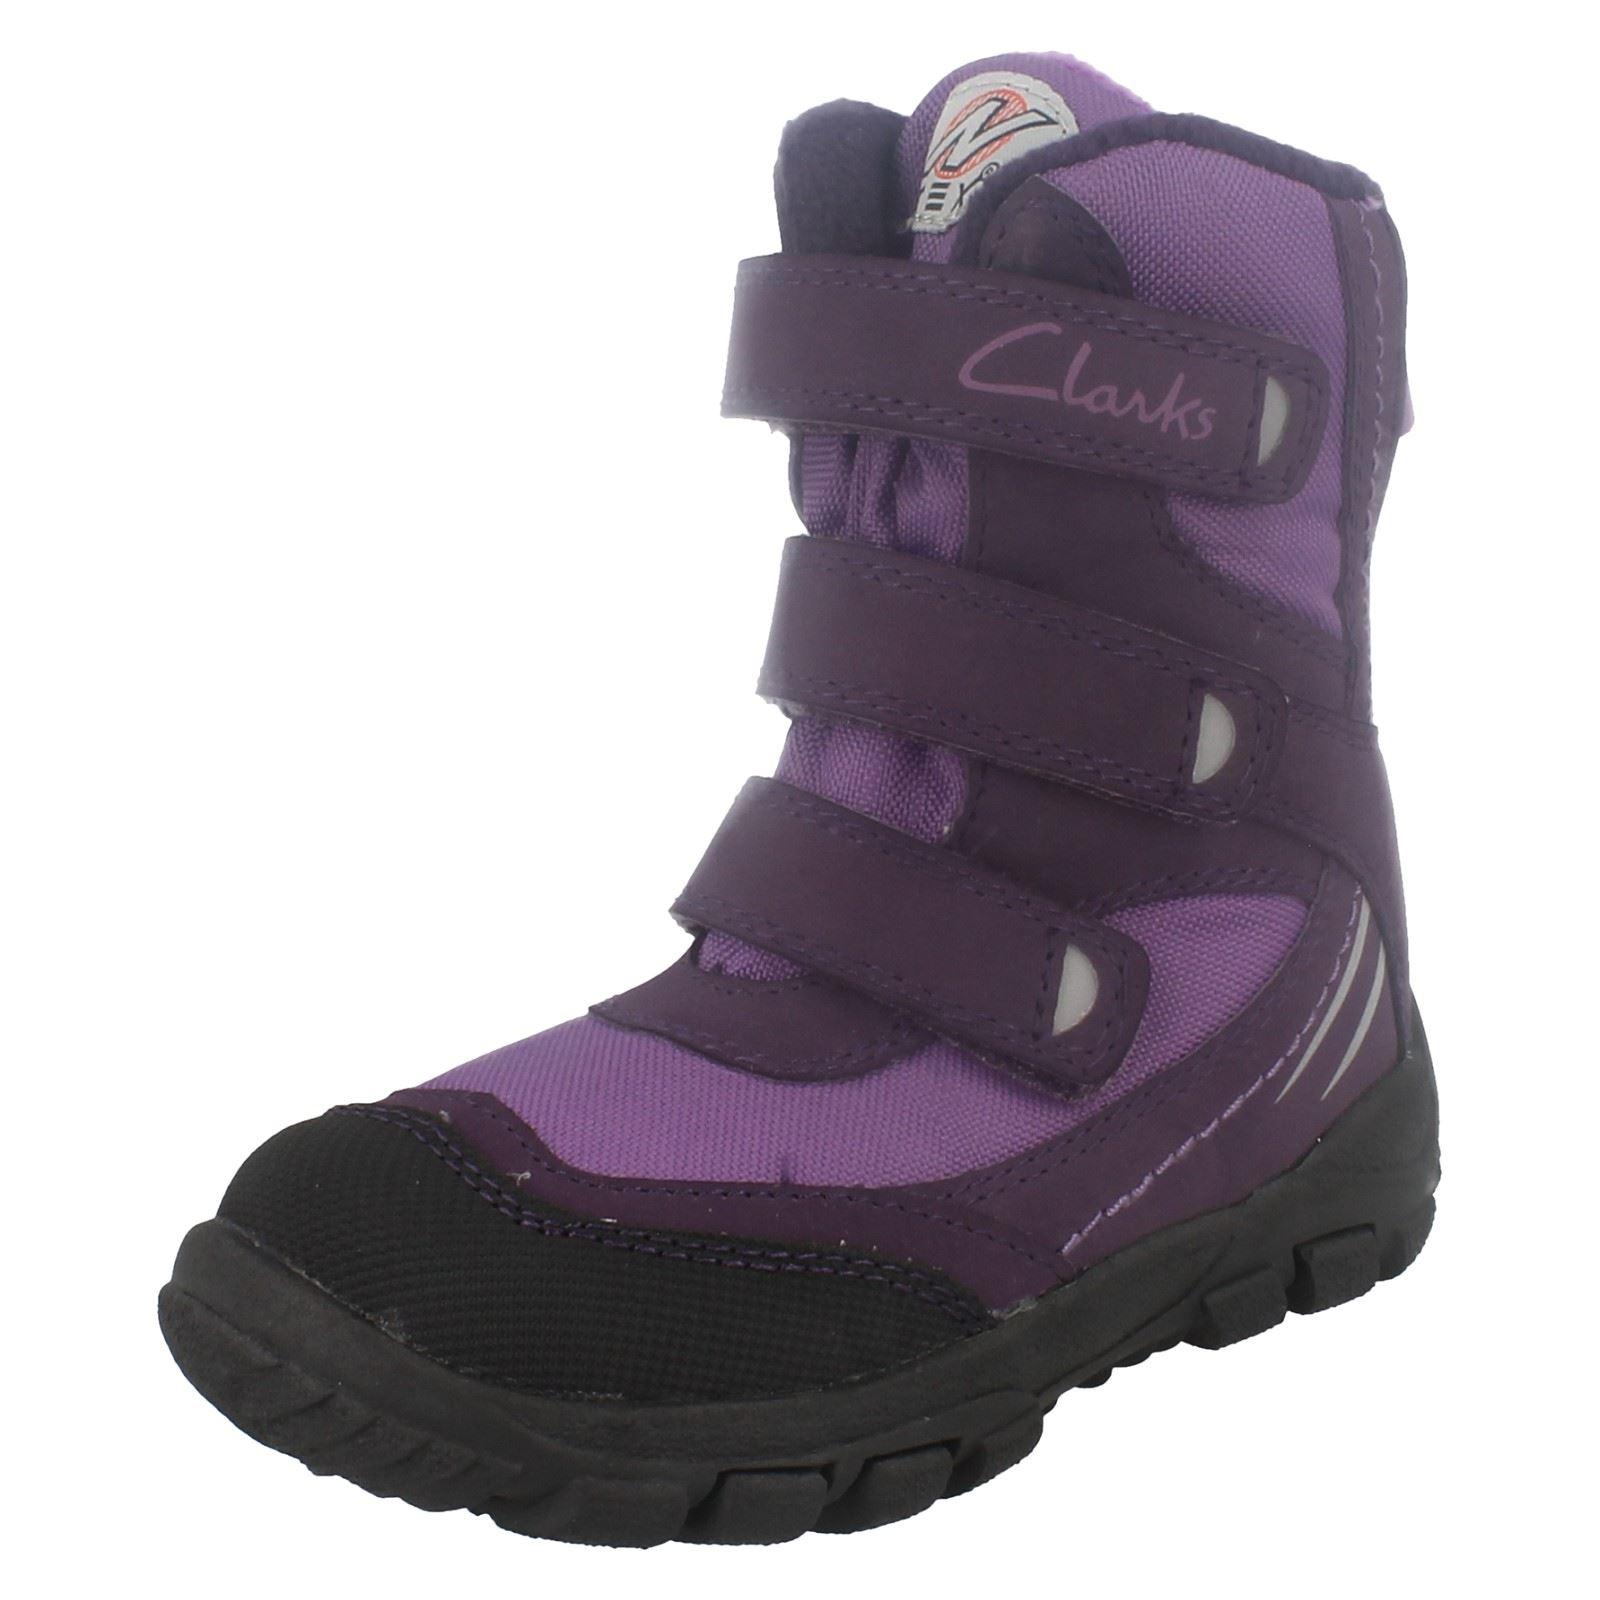 Loop G día Clarks para púrpura Botas nieve niñas Hook para la wOCPXSq